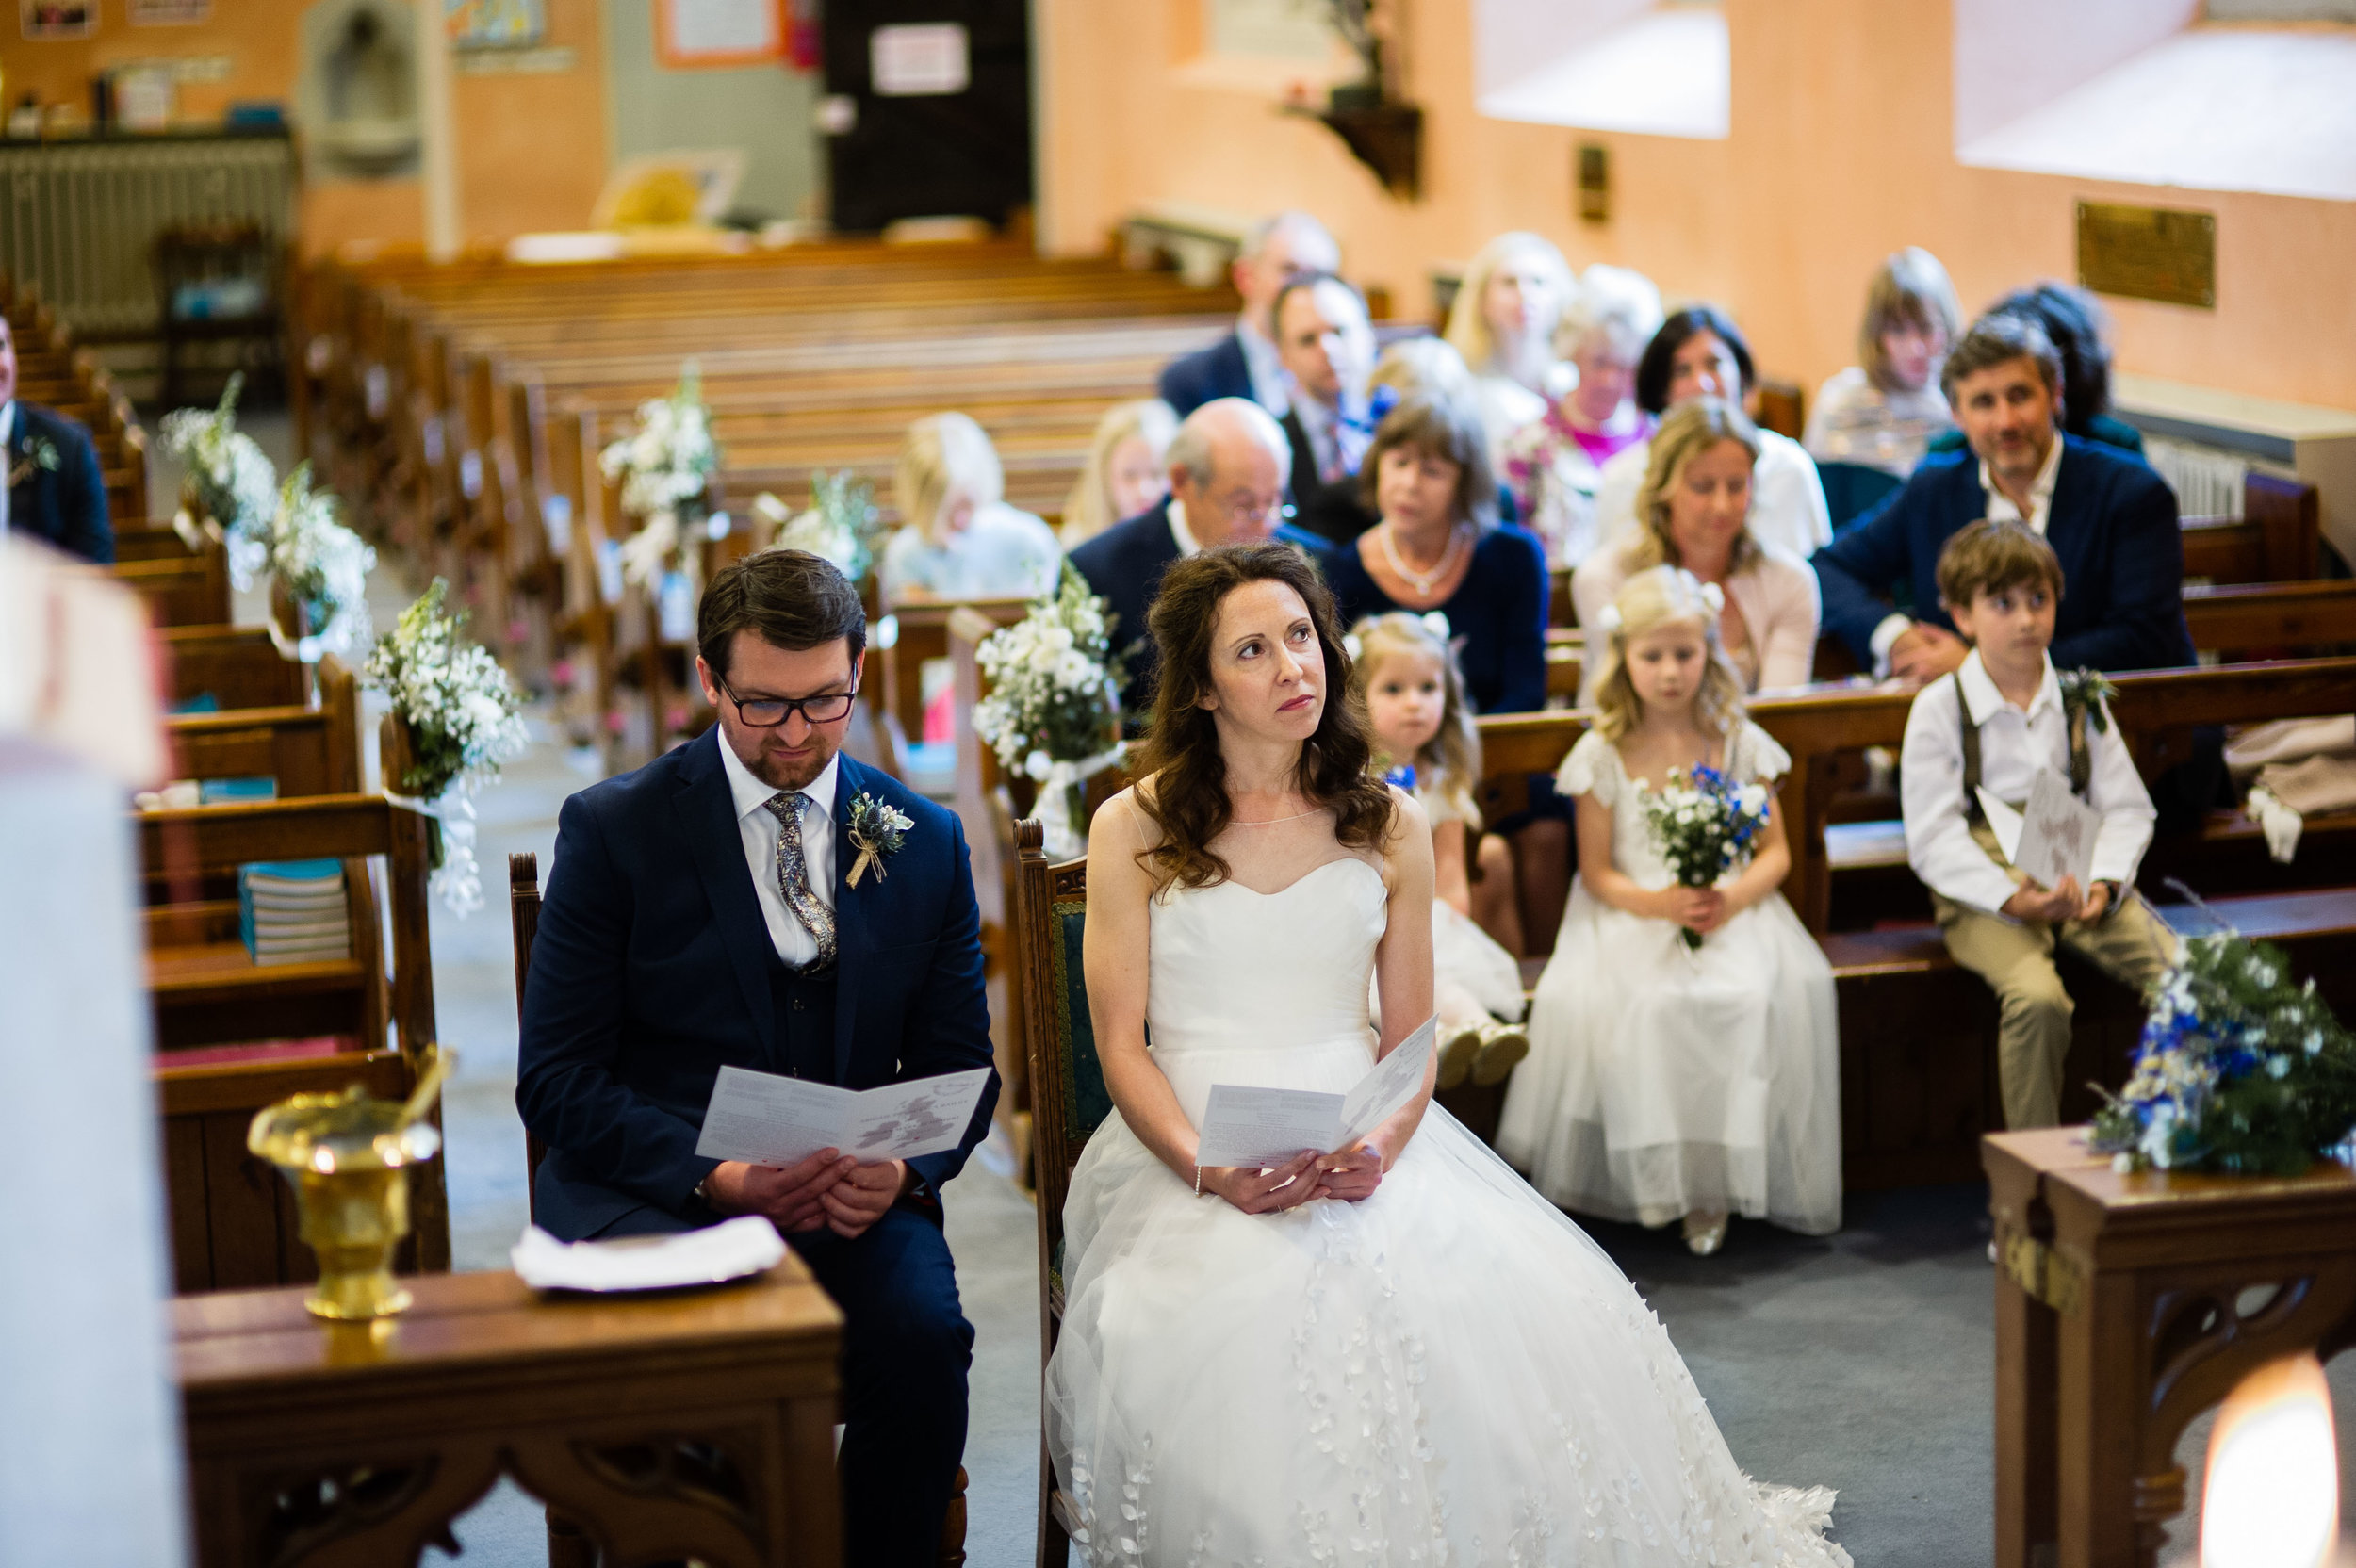 Beechfield house weddings - Abby and Greg (33 of 208).jpg